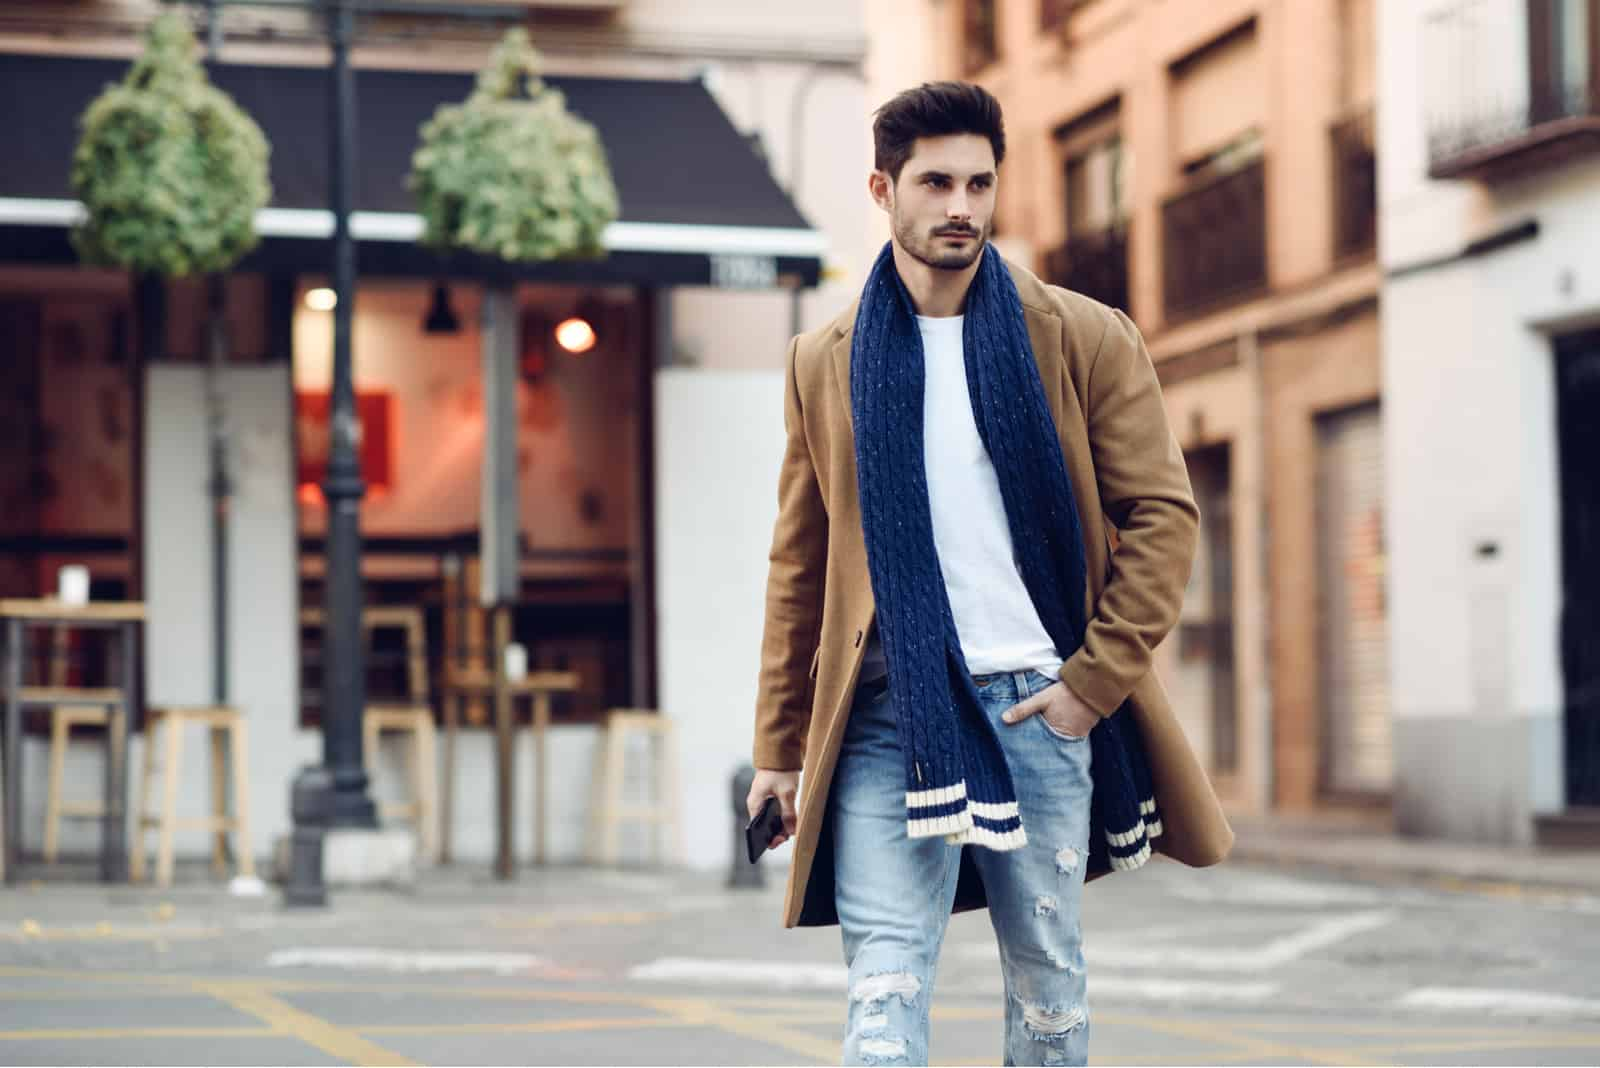 a man in a brown coat walks down the street